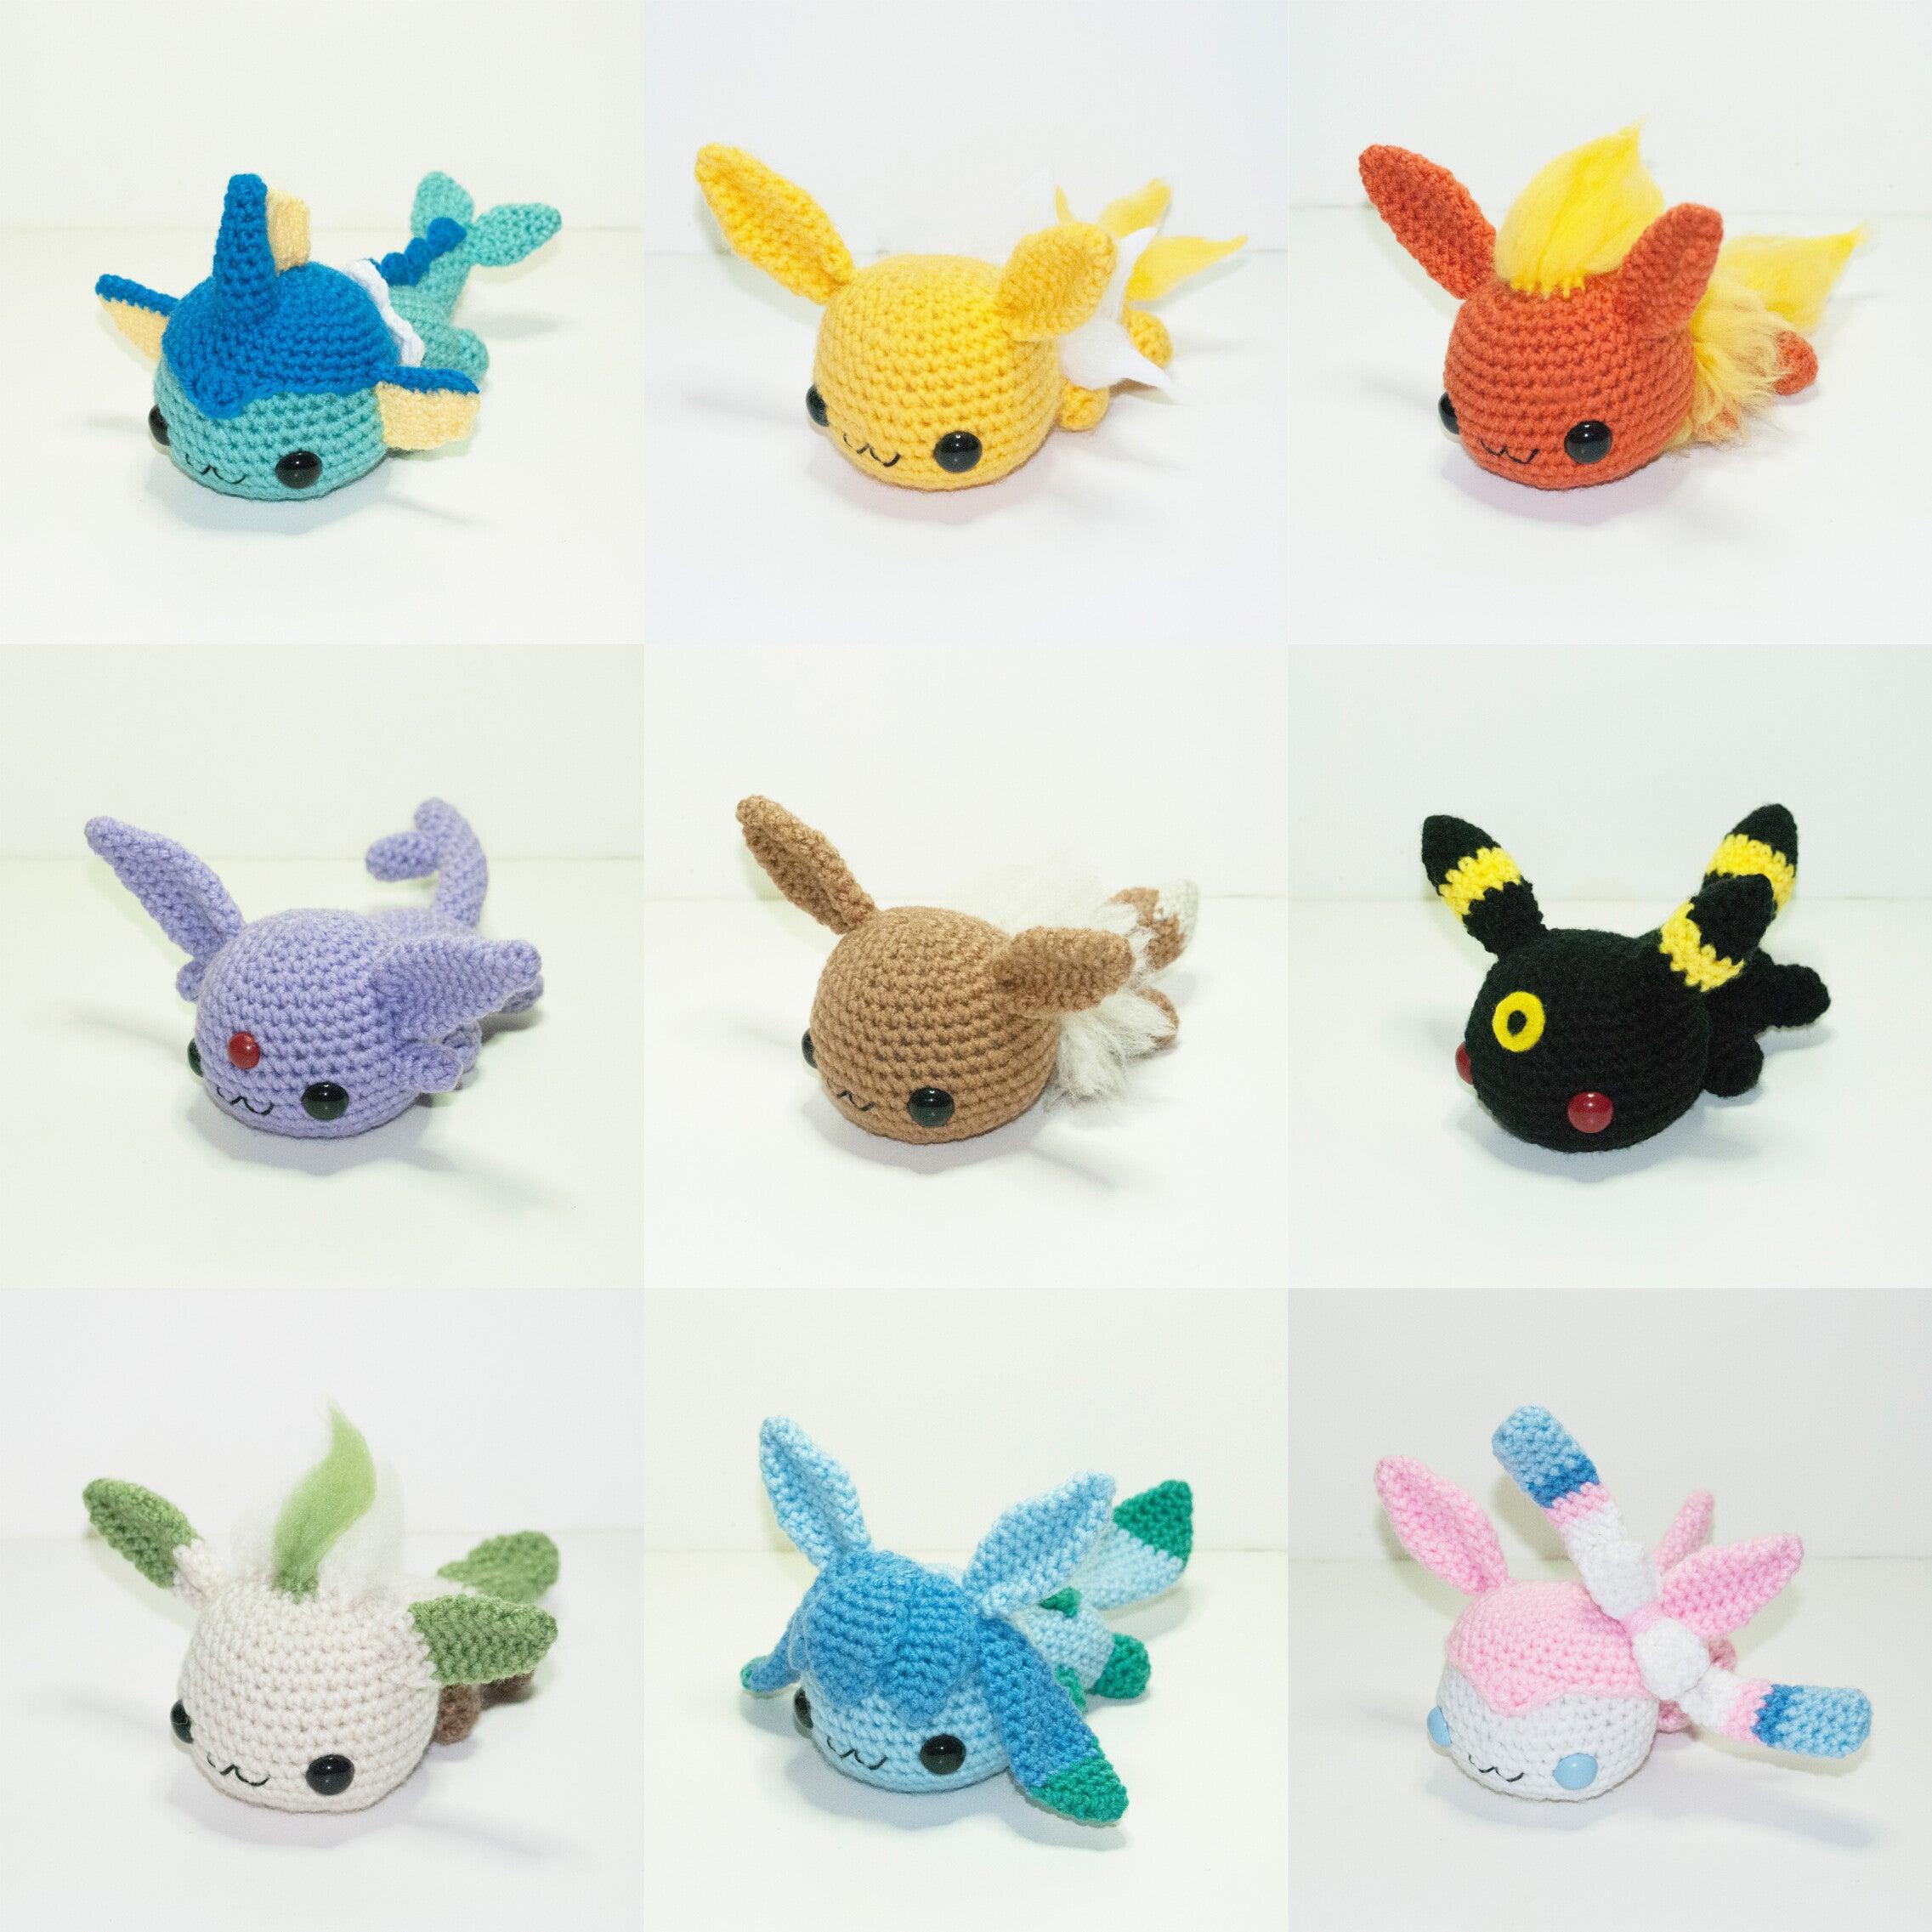 Crochet Patterns Pokemon Characters : Even Crocheted Pokemon Need Rest After Battle Kotaku ...